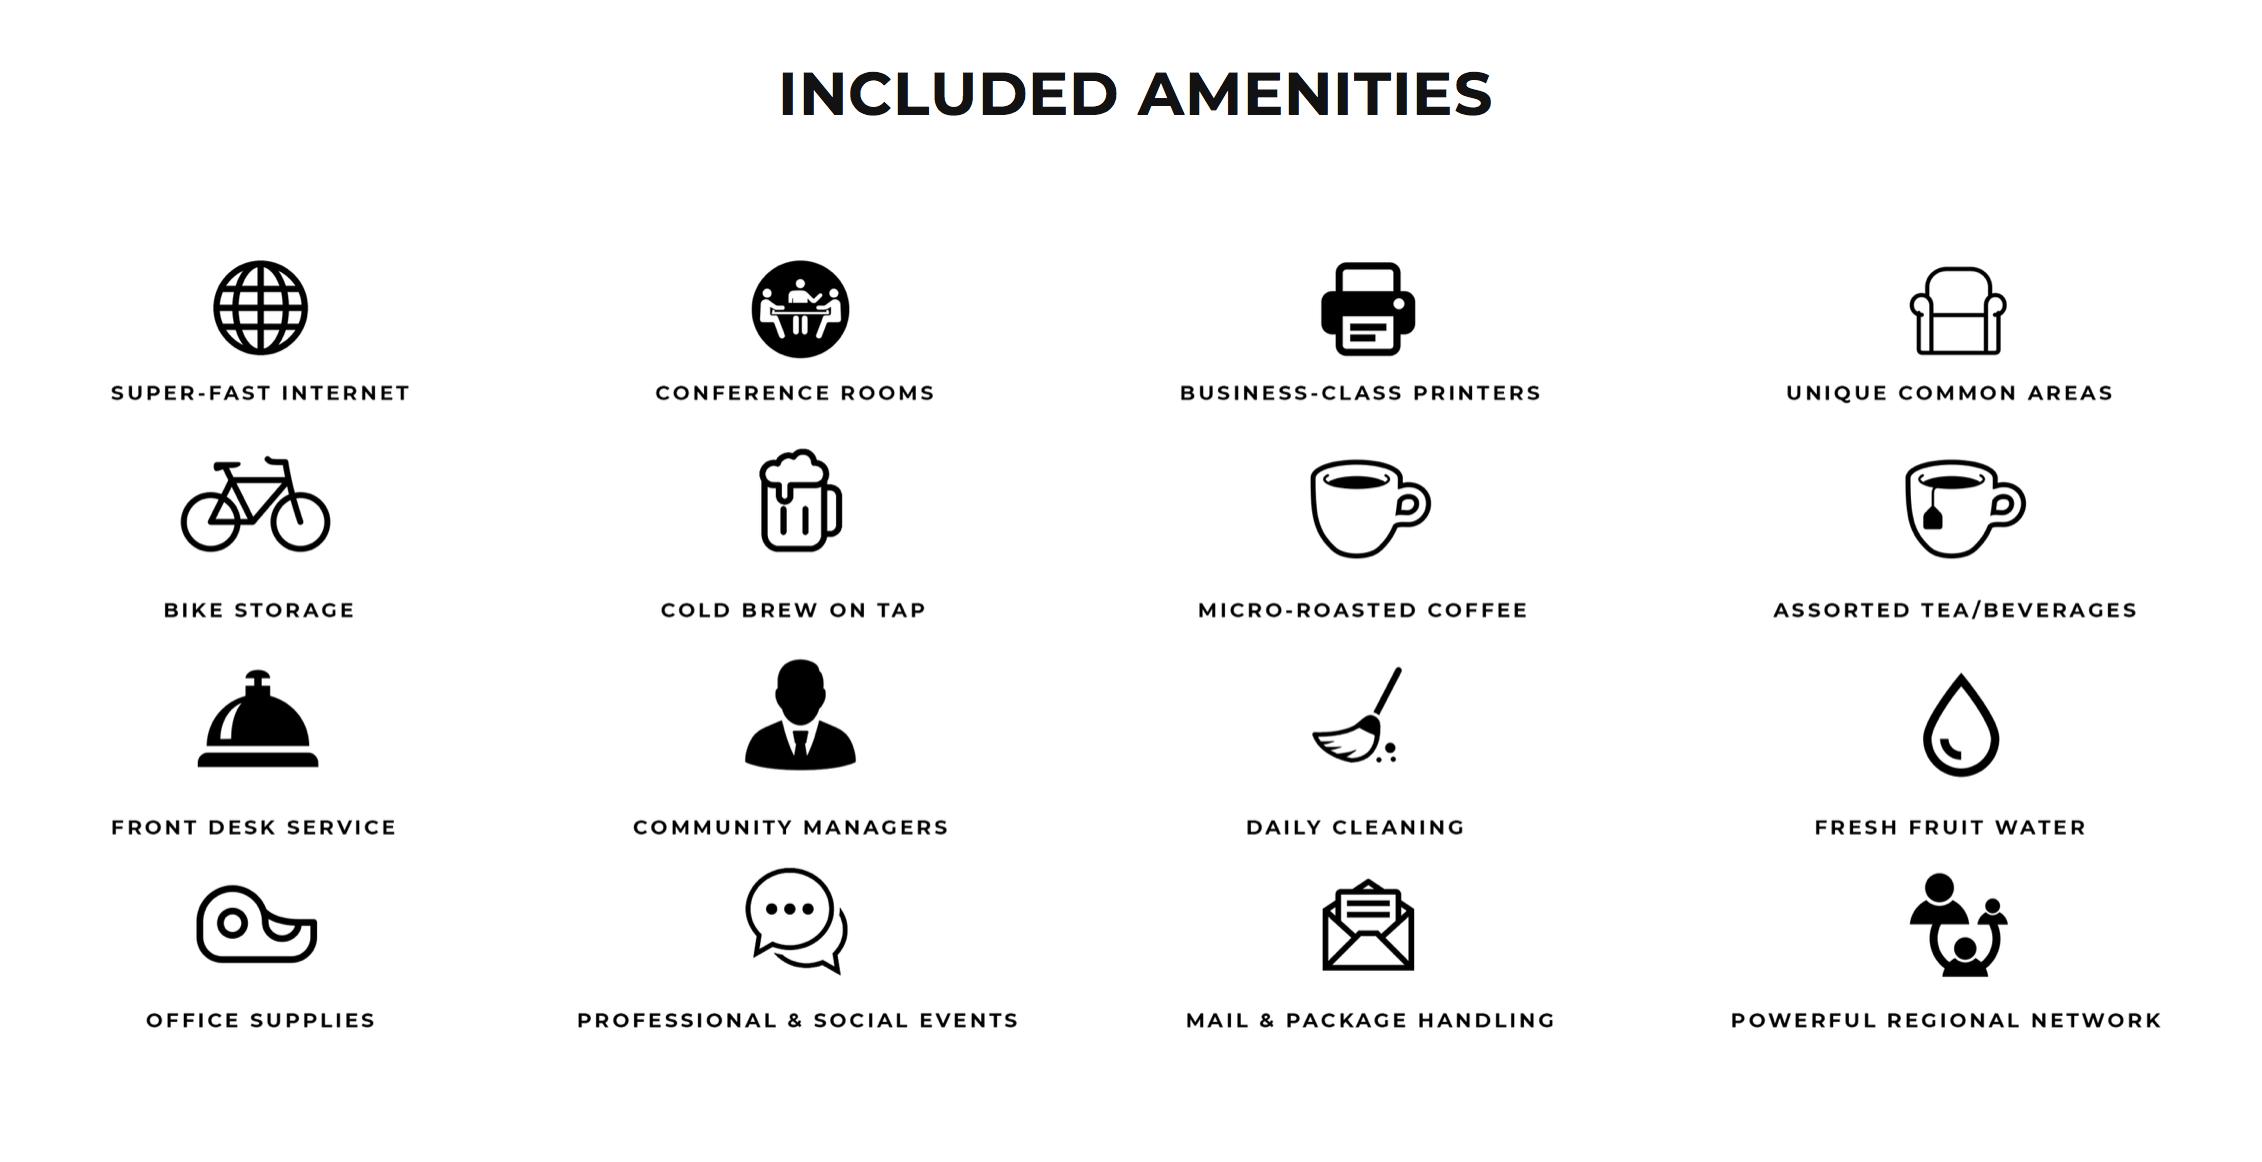 run-bgd-amenities.png